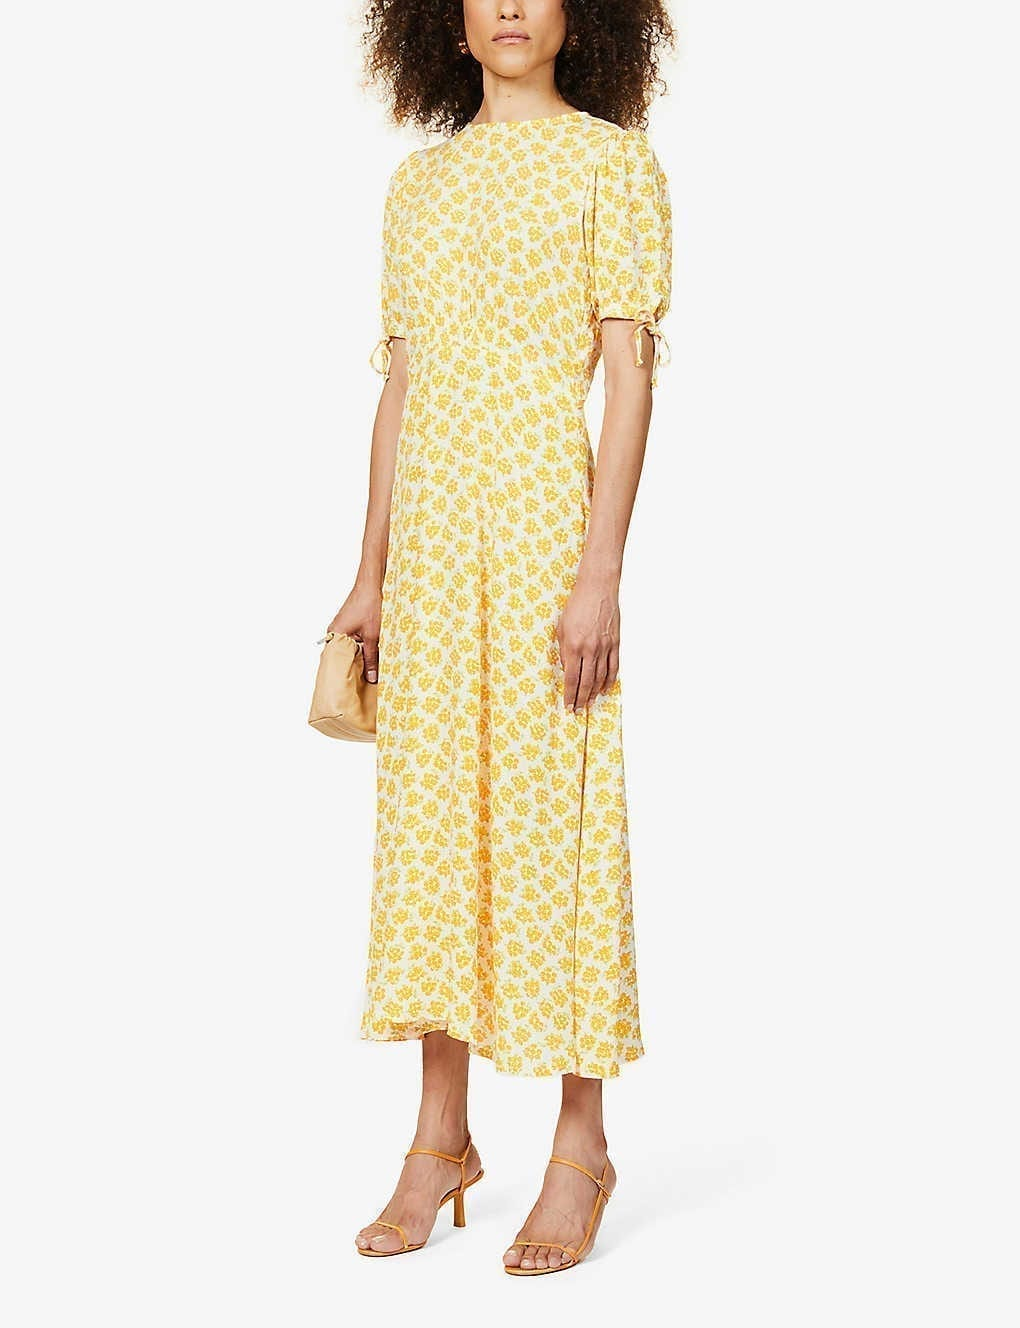 FAITHFULL THE BRAND Brida Floral-Print Woven Midi Dress